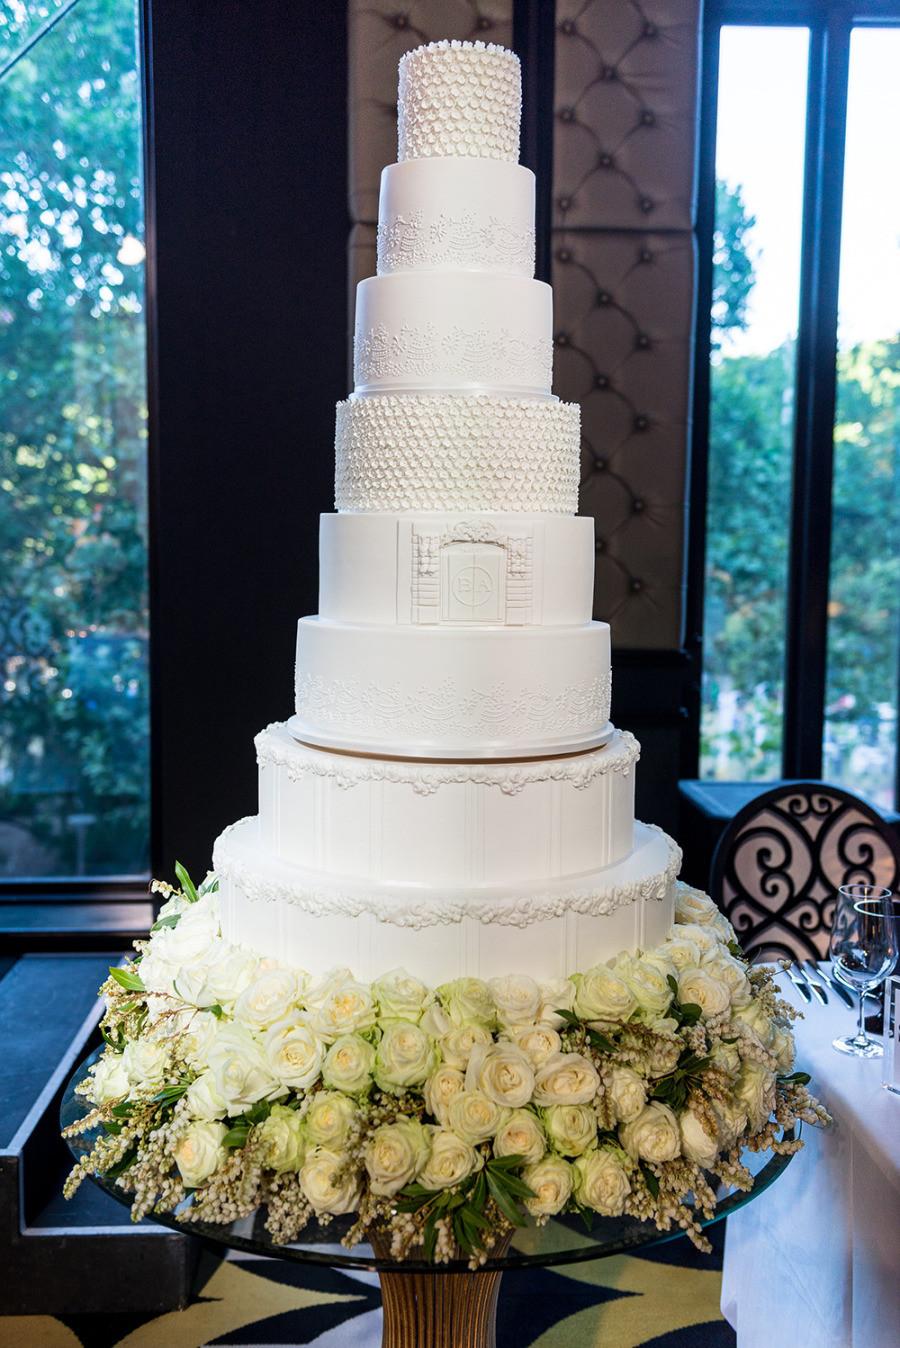 Wedding Cakes Ideas  Awe Inspiring Wedding Cakes Ideas to to Blow Your Mind